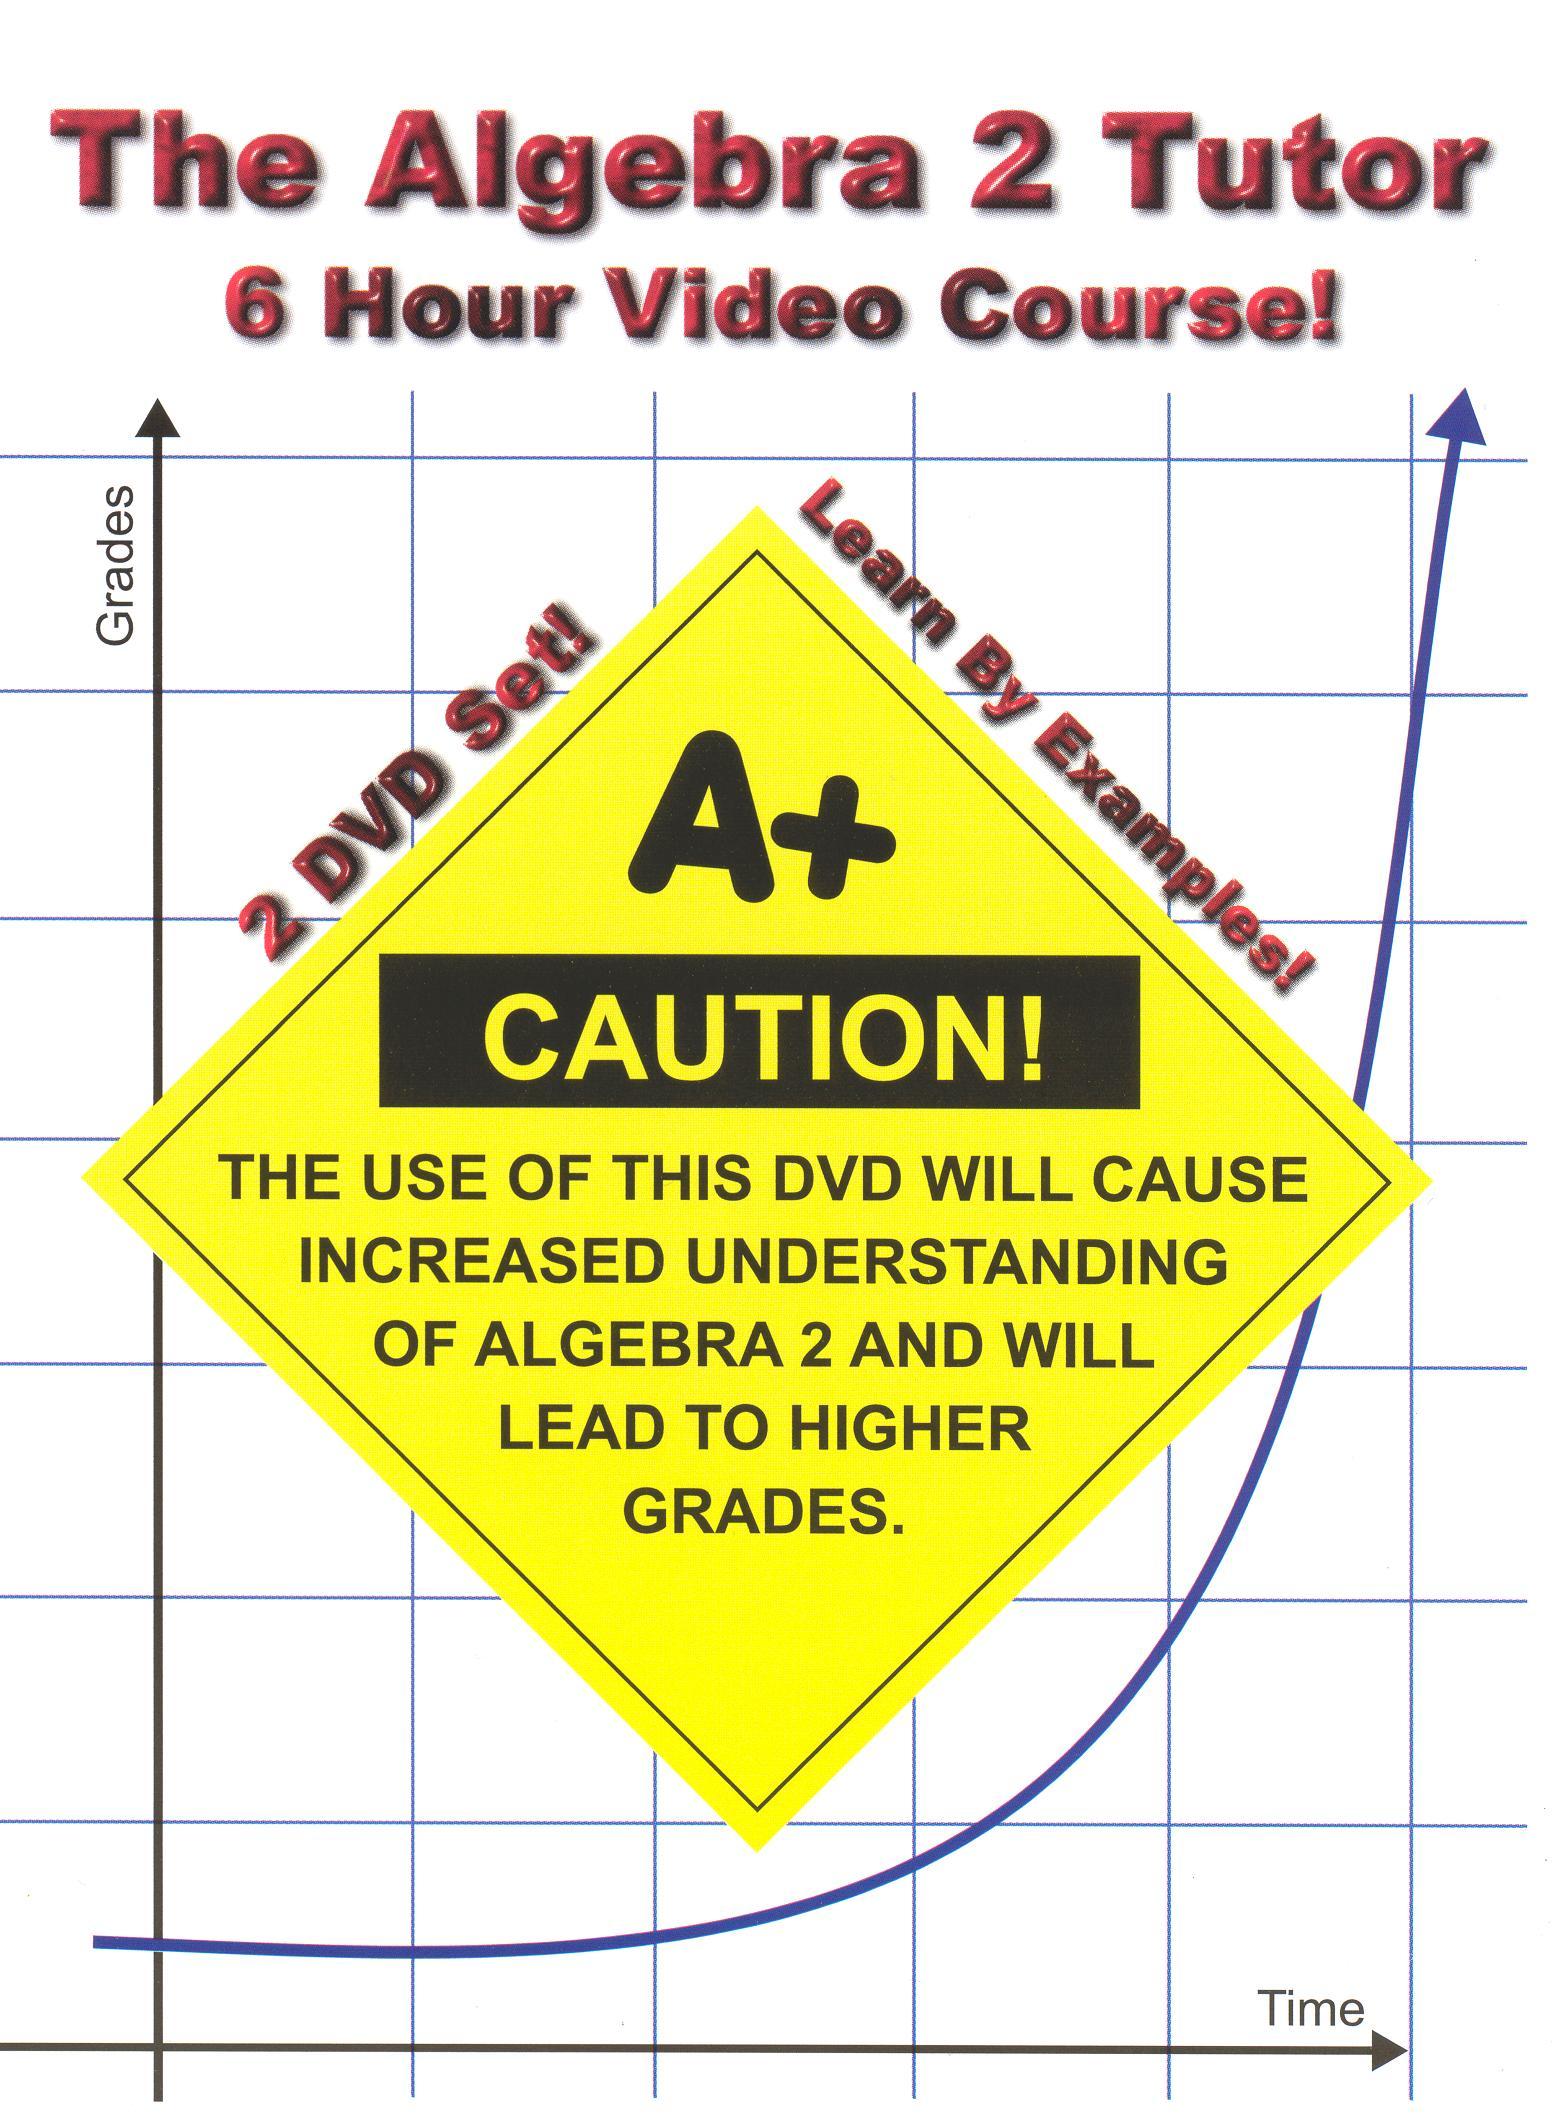 The Algebra 2 Tutor: 6 Hour Video Course